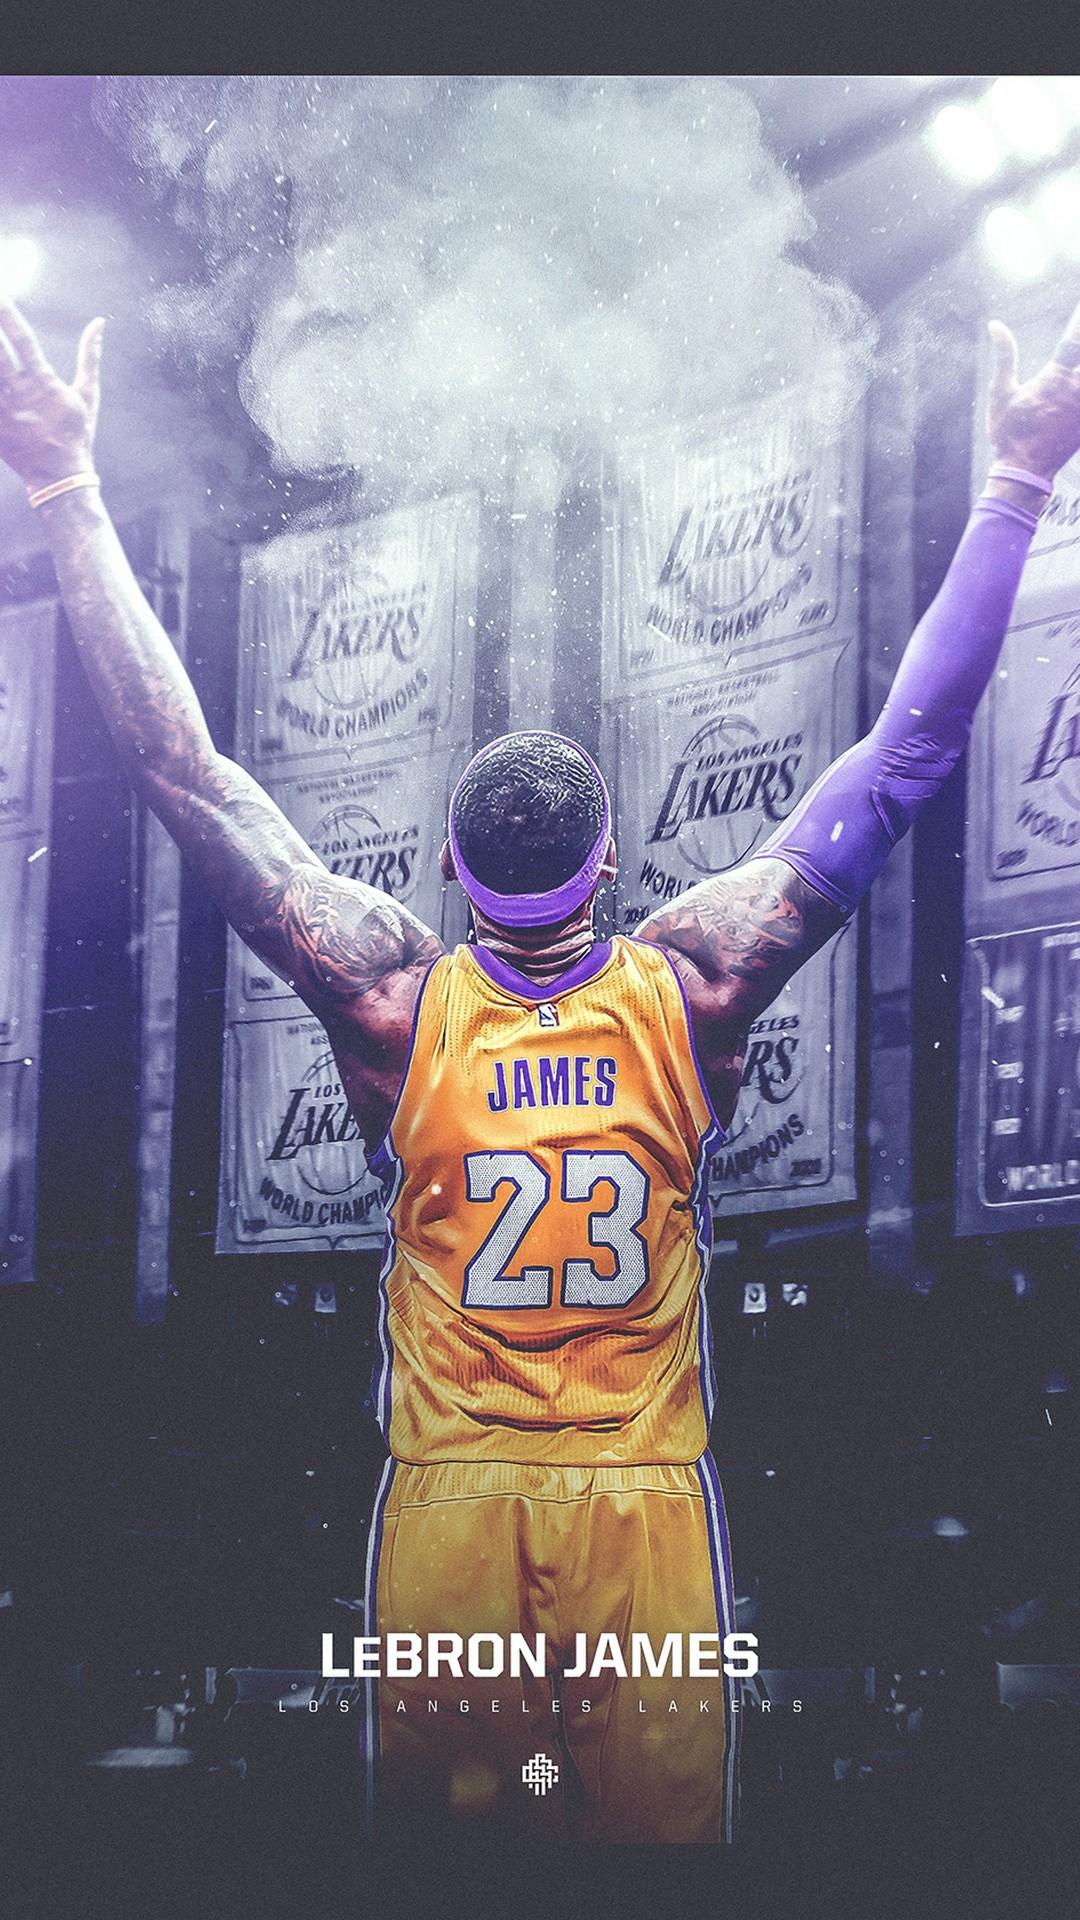 LeBron James LA Lakers HD Wallpaper For iPhone 2020 Basketball 1080x1920